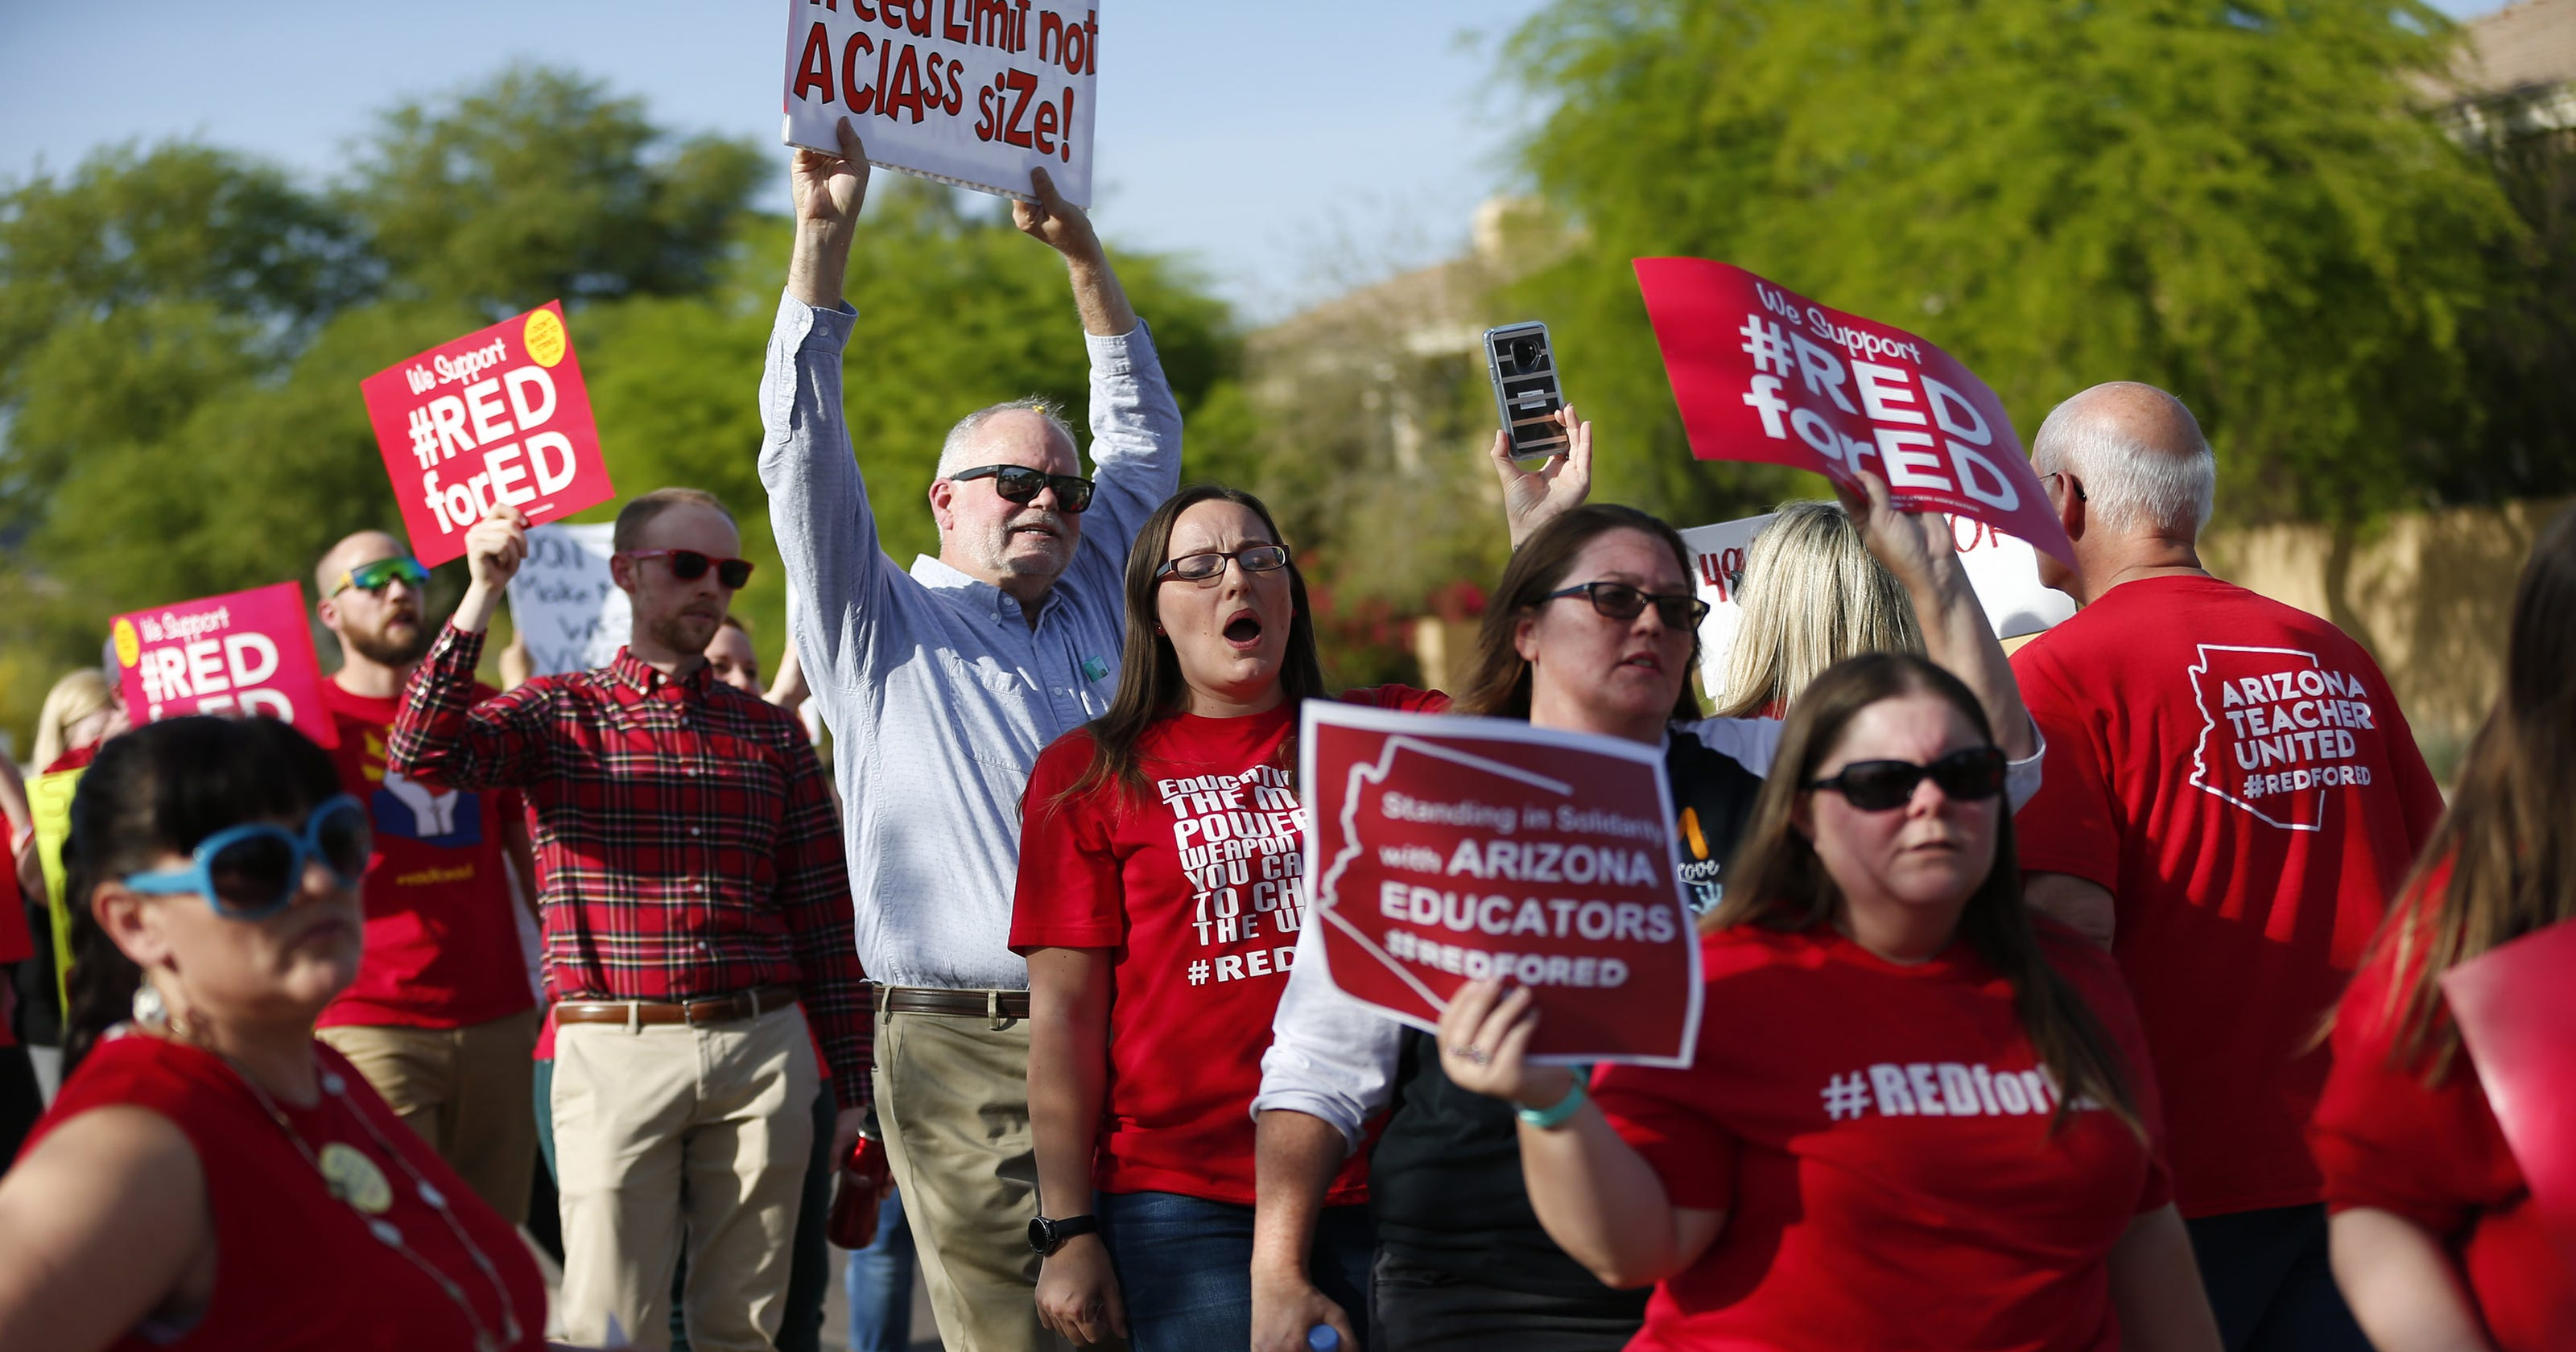 dd71dba7 What are Arizona teachers' 5 demands?